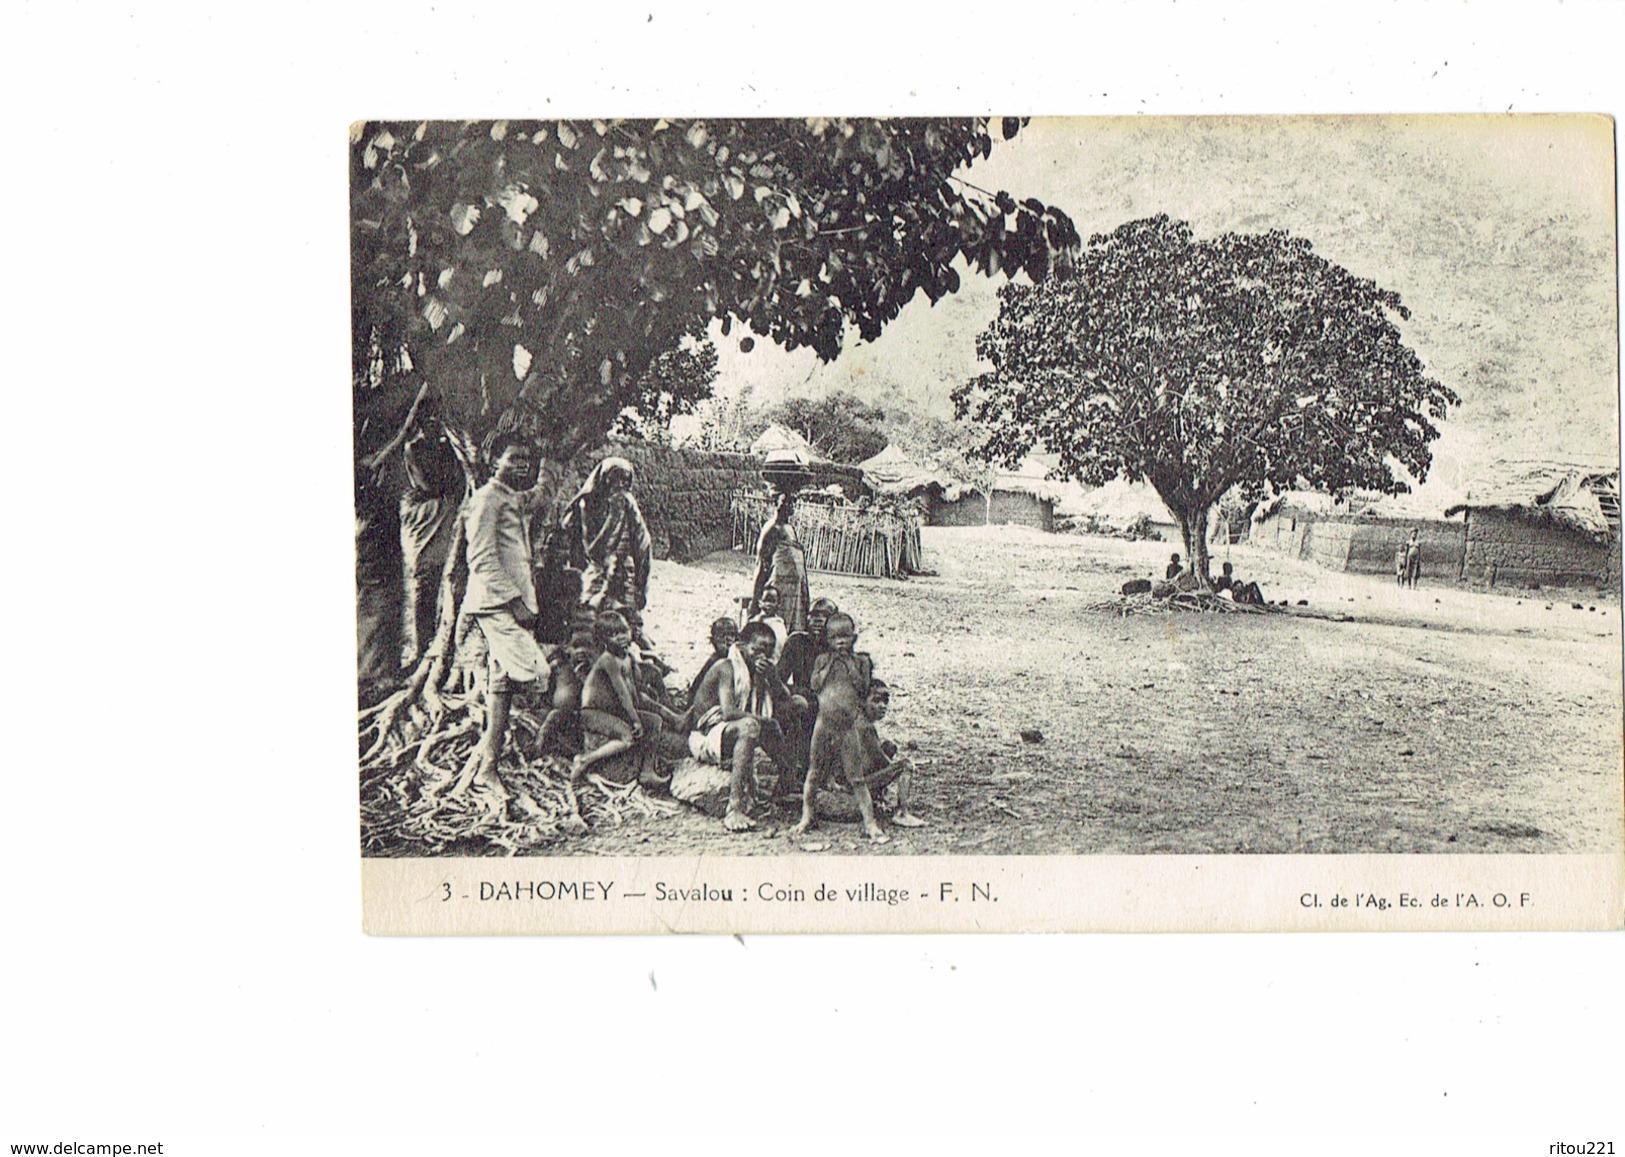 Cpa - Afrique - Dahomey - SAVALOU - Coin Du Village - F.N. N°3 A.O.F. - Arbre Garçon Nu Enfants - Dahomey